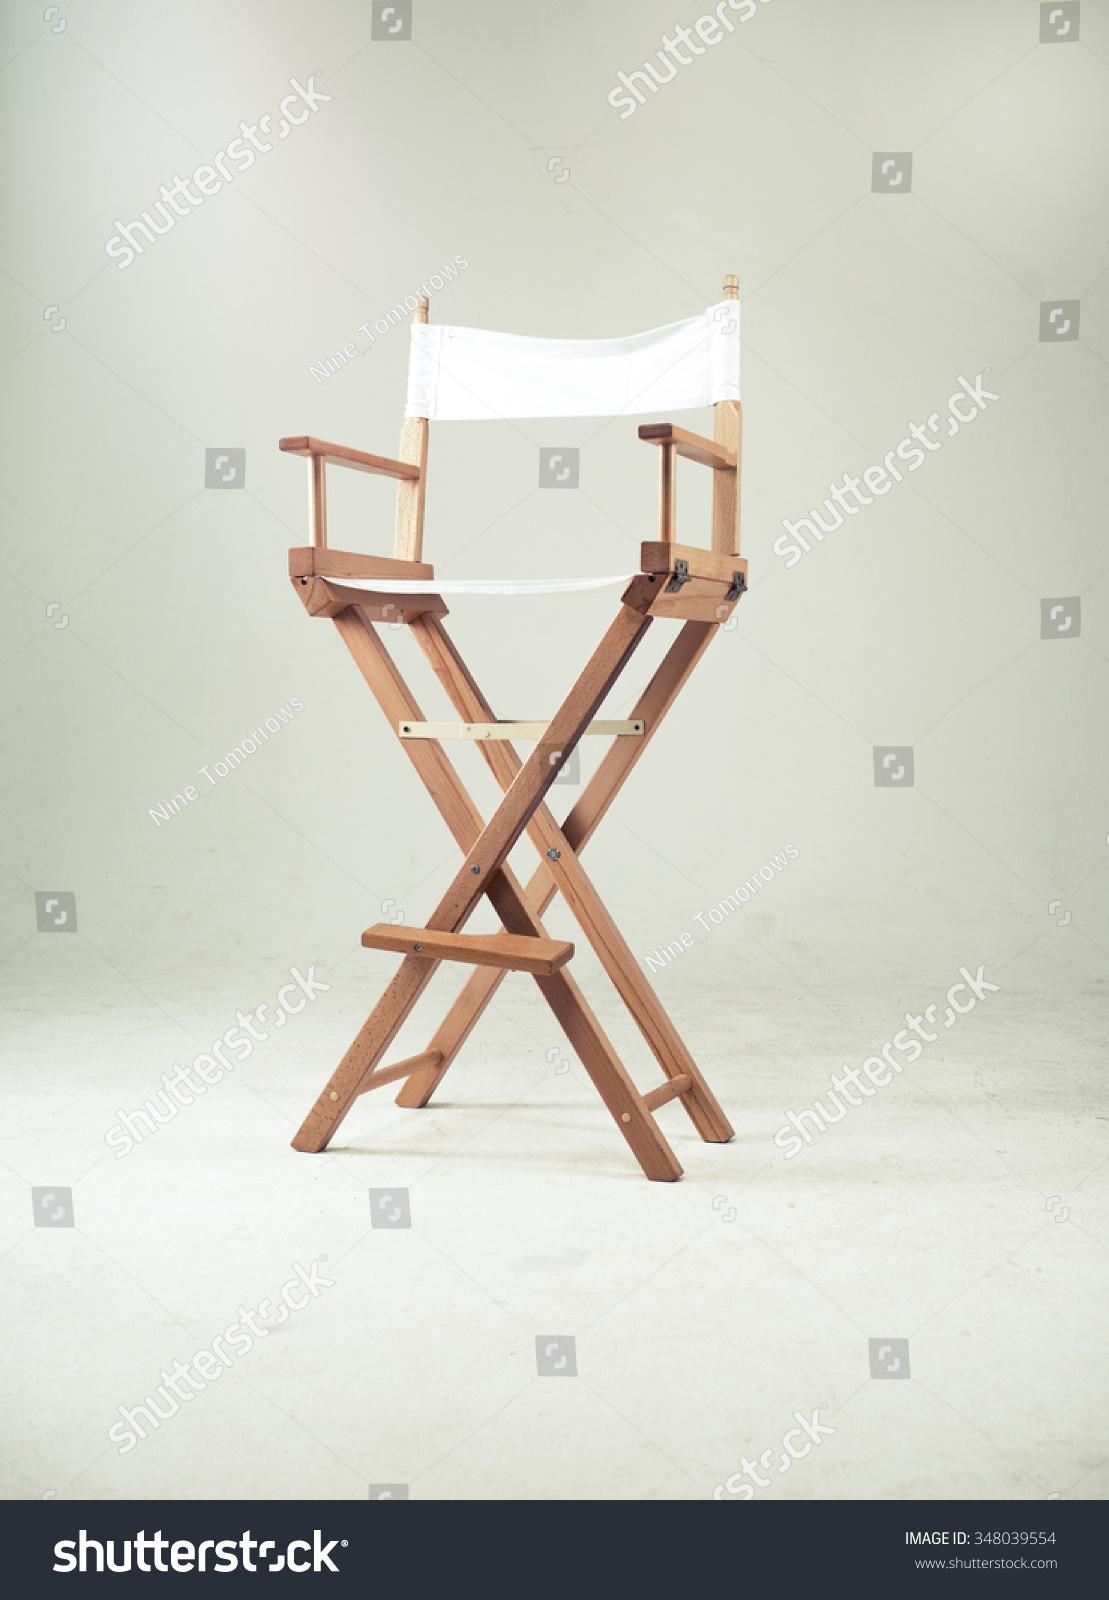 Beau High Director Chair Bar Stool On White Background. Shallow Focus. Studio.